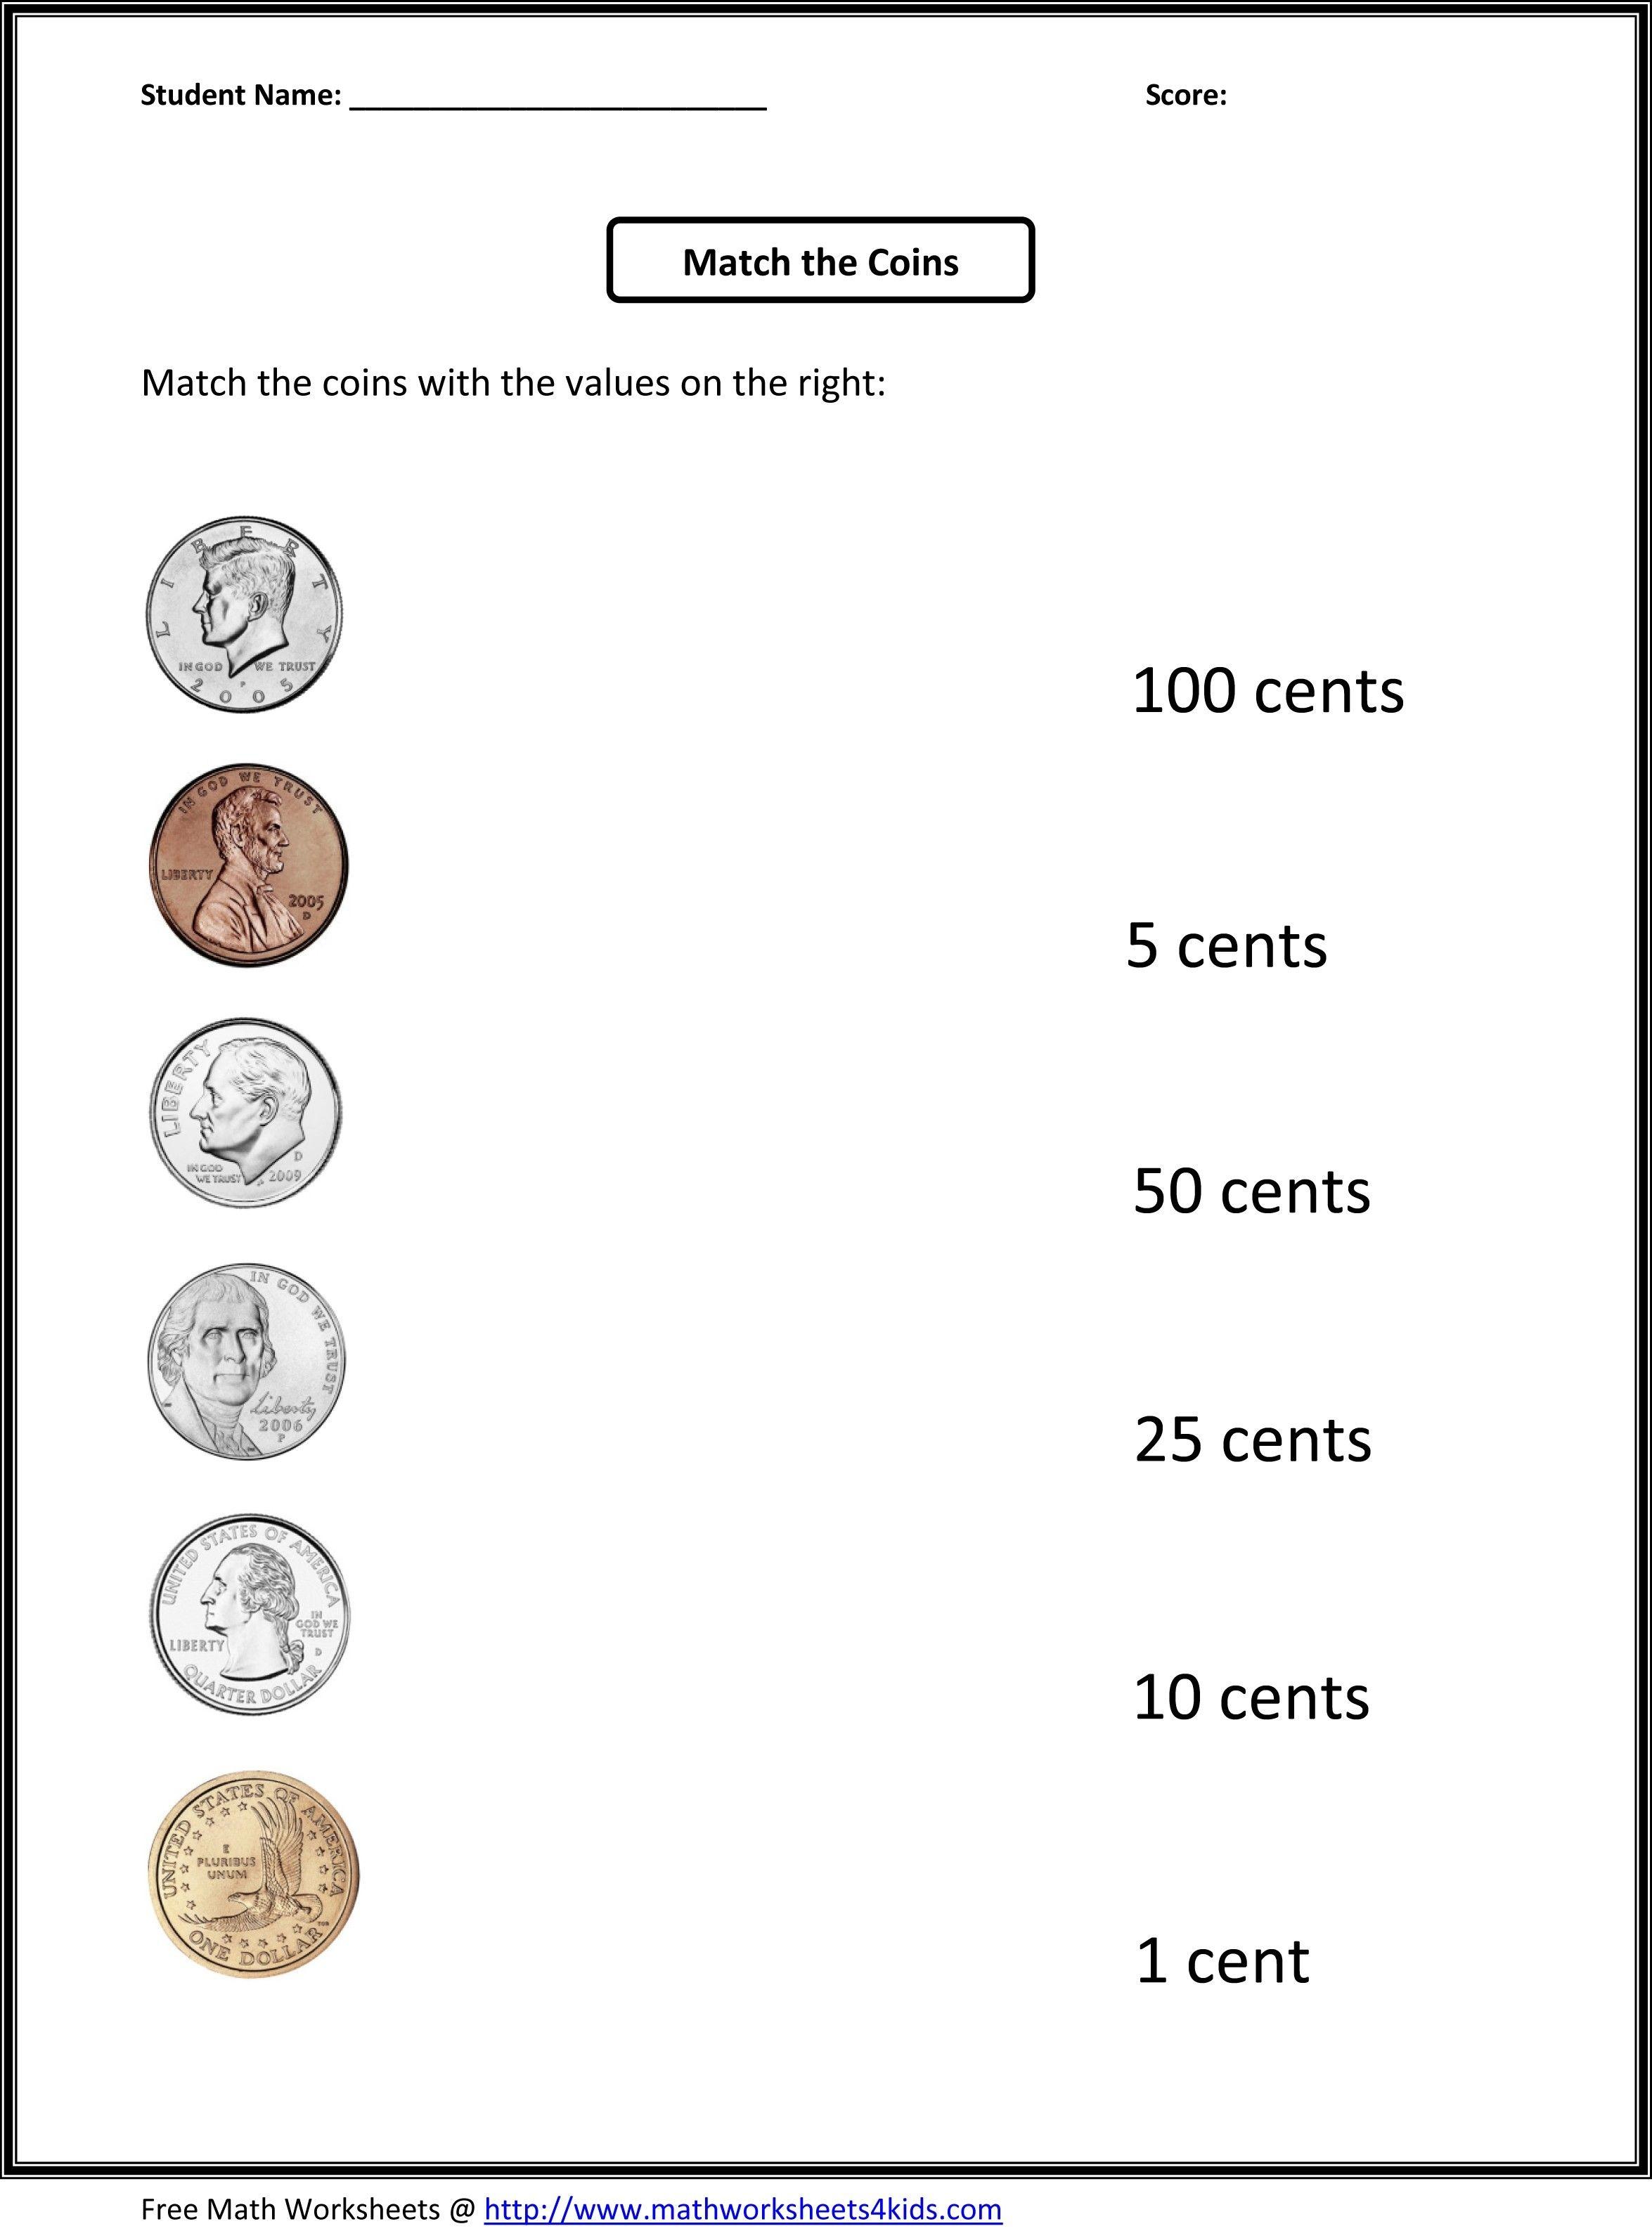 Best Of Printable Money Worksheets First Grade | Fun Worksheet | Printable Math Worksheets For 1St Grade